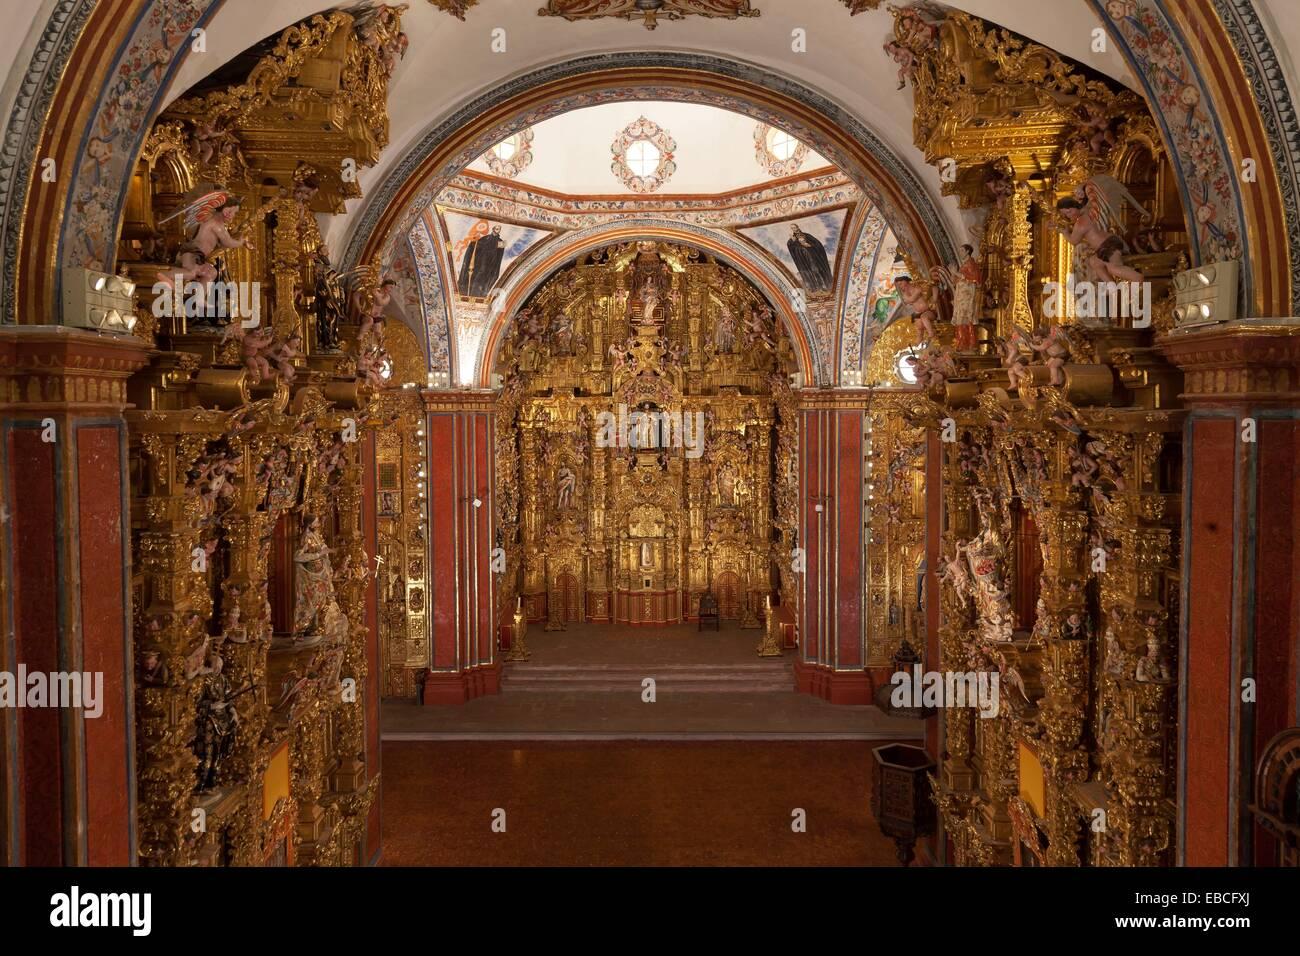 Altar altarpiece america art art museum baroque building for Churches of baroque period